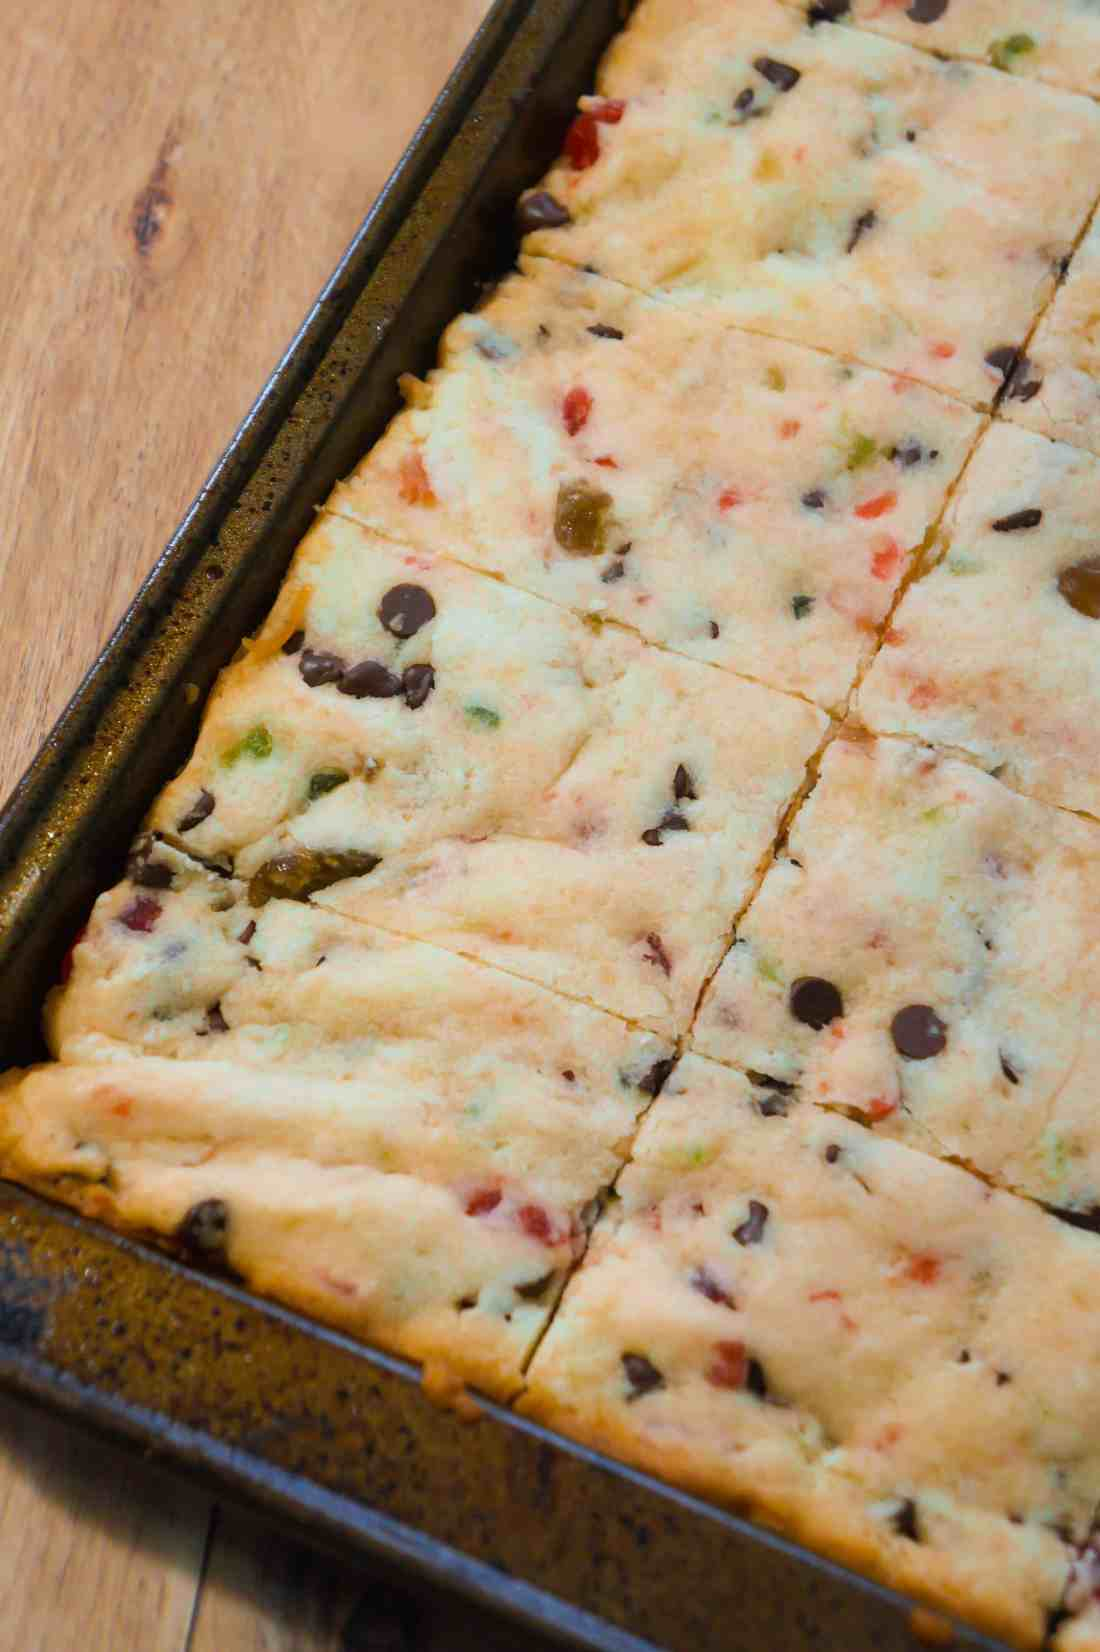 Pan of cherry shortbread cookie bars